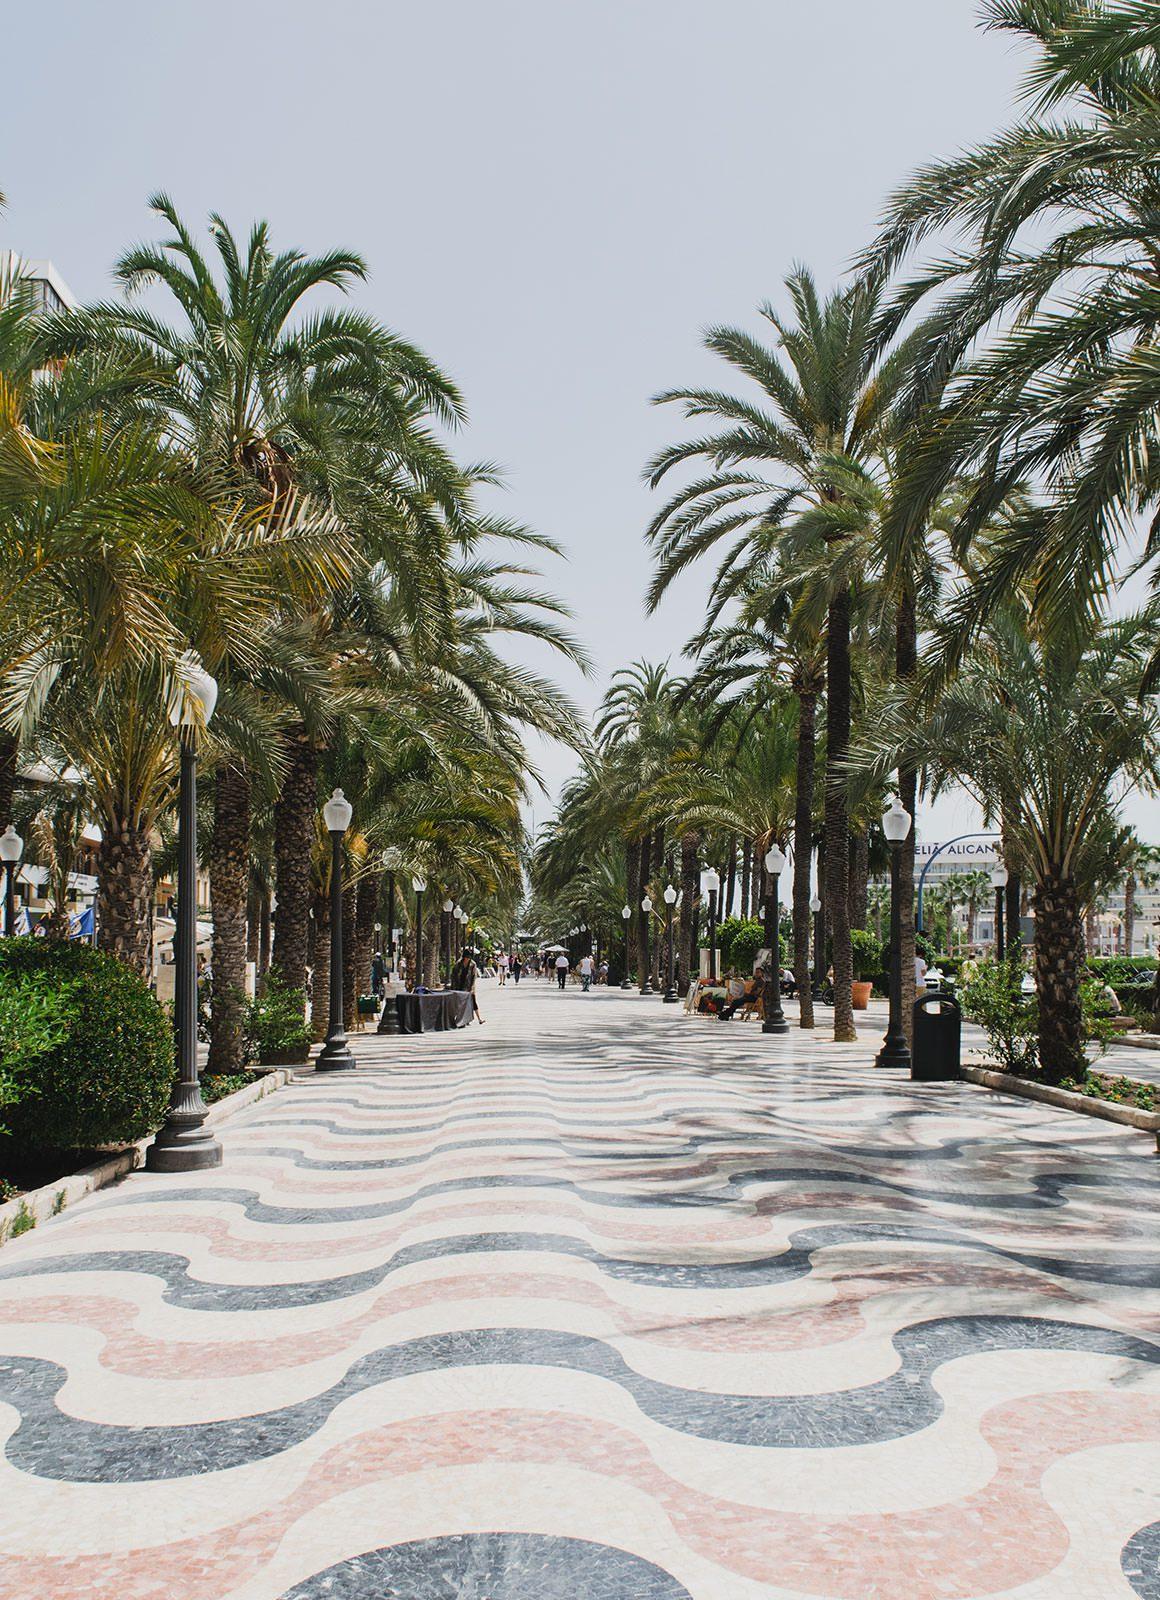 Barcelona to Madrid Road Trip - Alicante, Spain